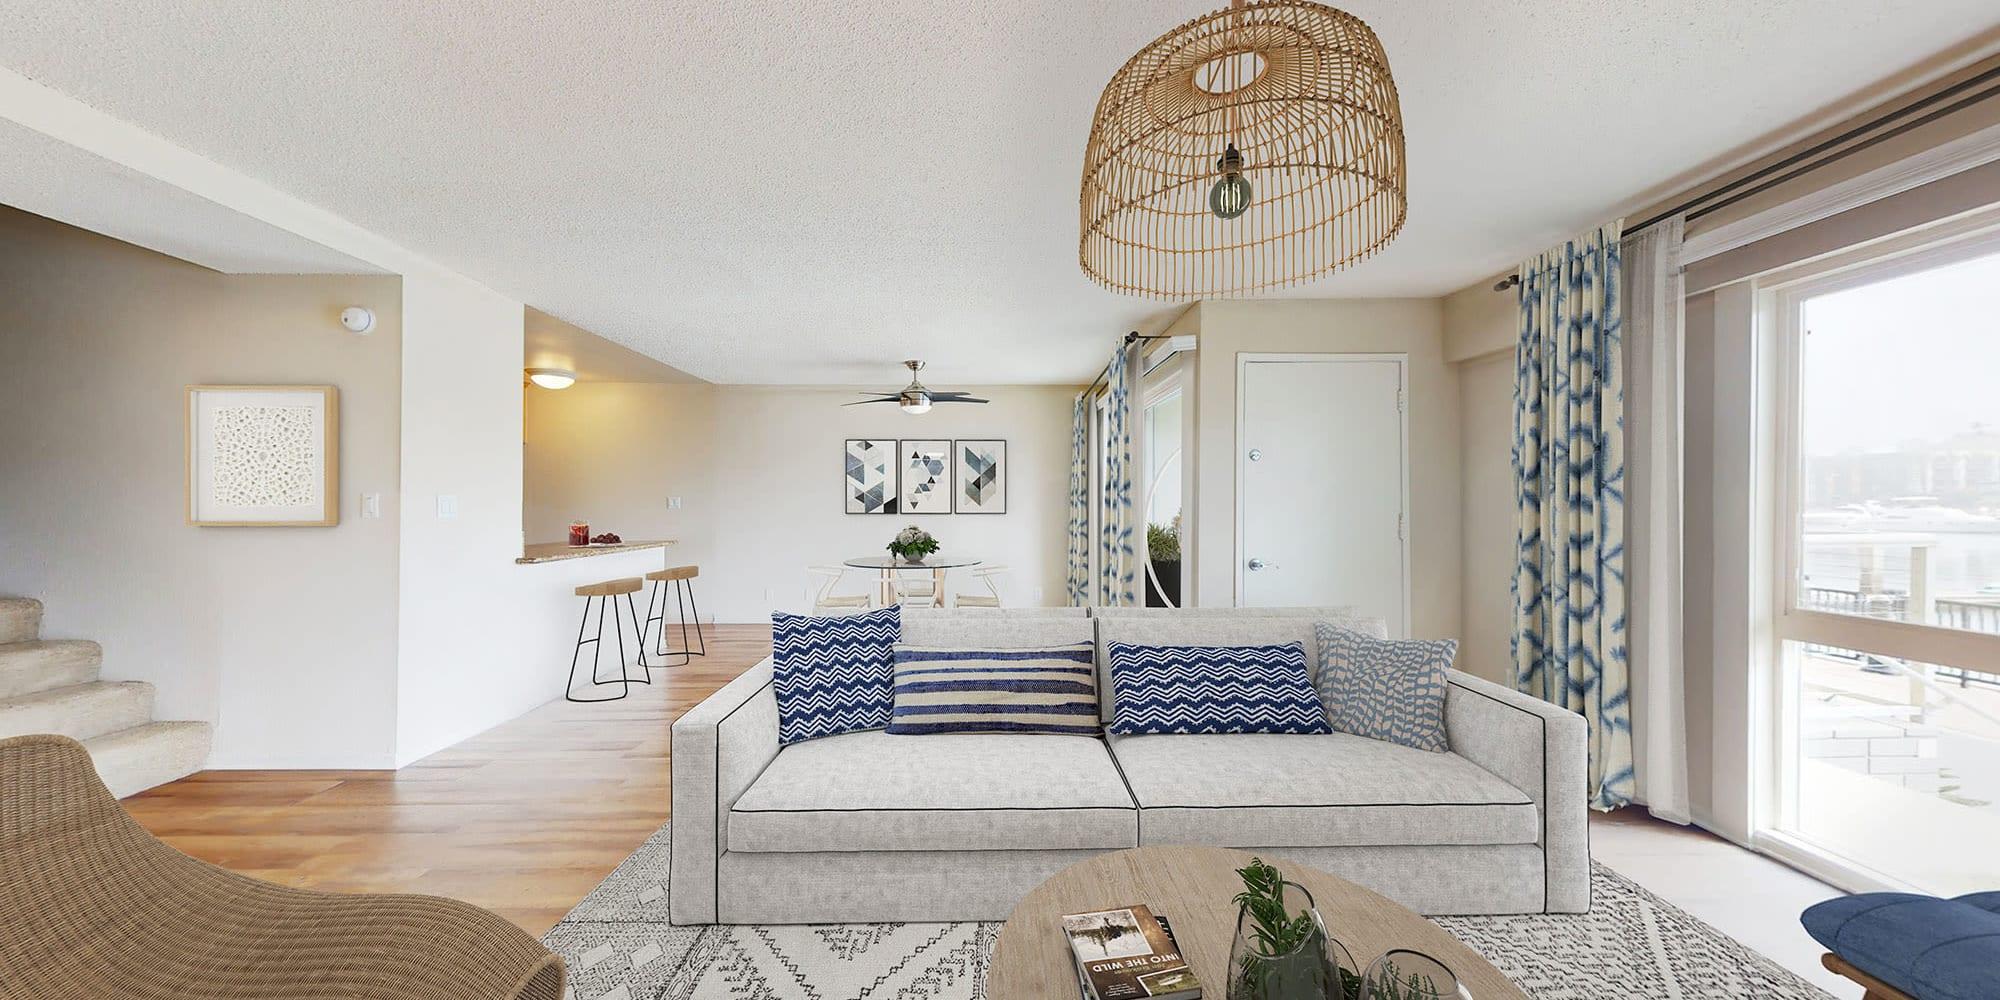 Living room with a view at The Tides at Marina Harbor in Marina del Rey, California